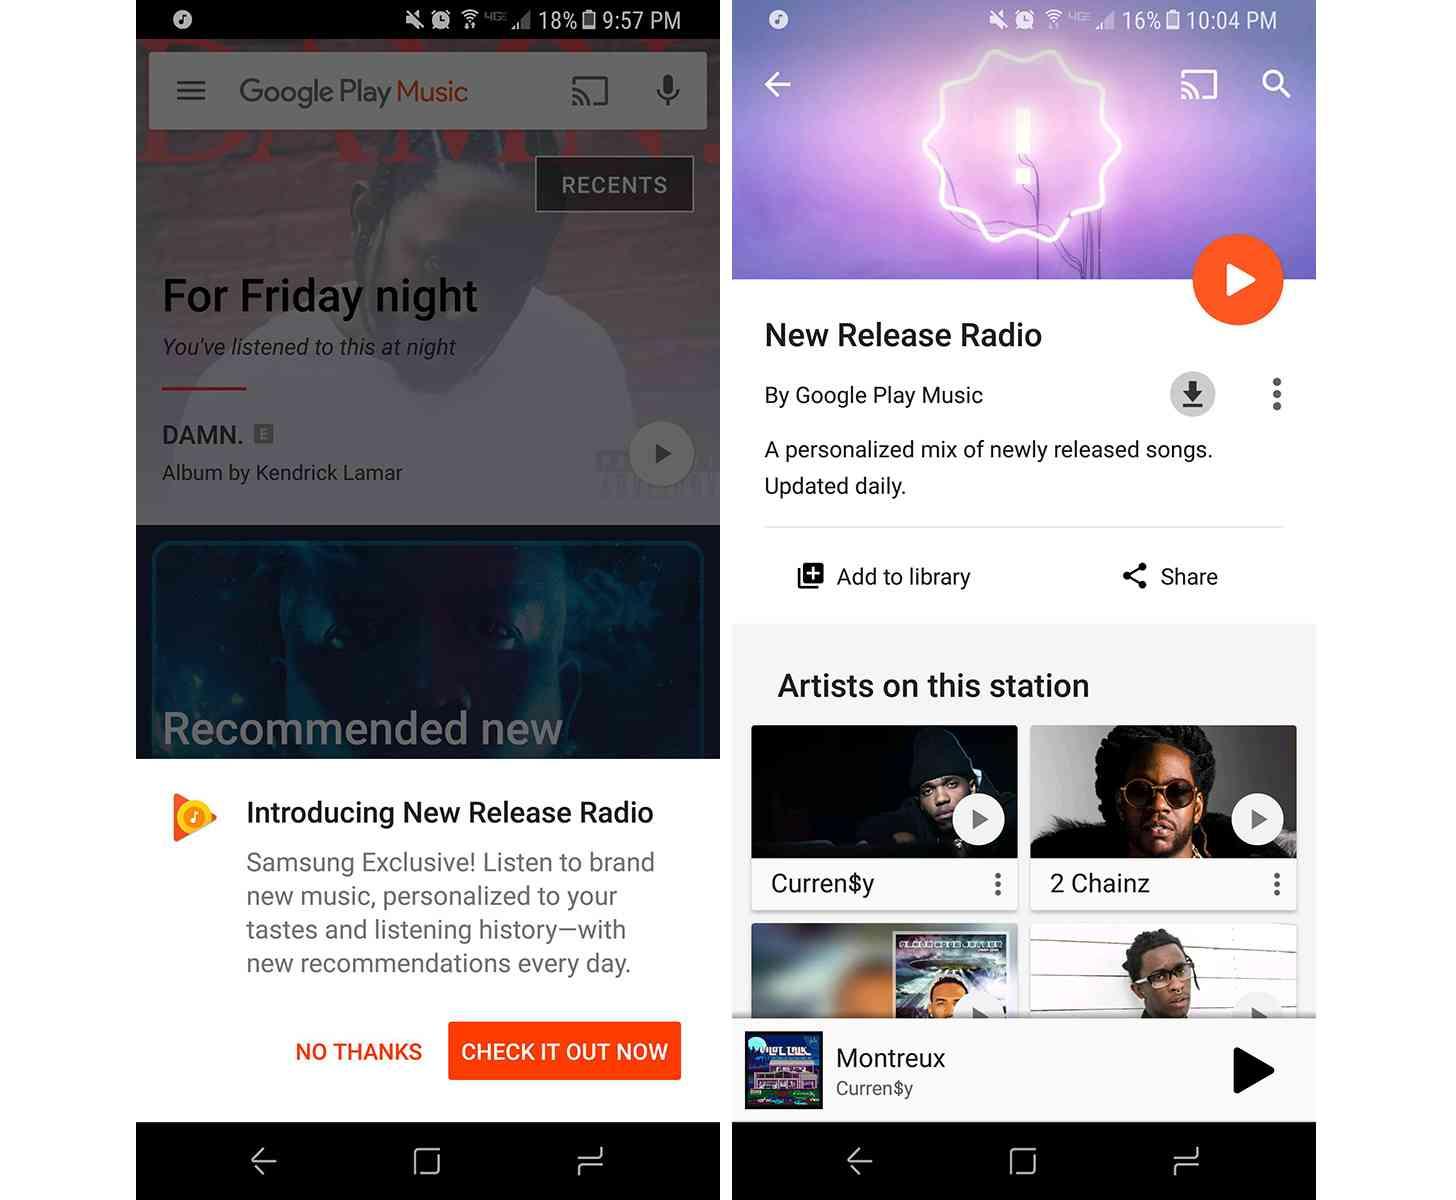 Samsung Galaxy S8 Google Play Music New Release Radio